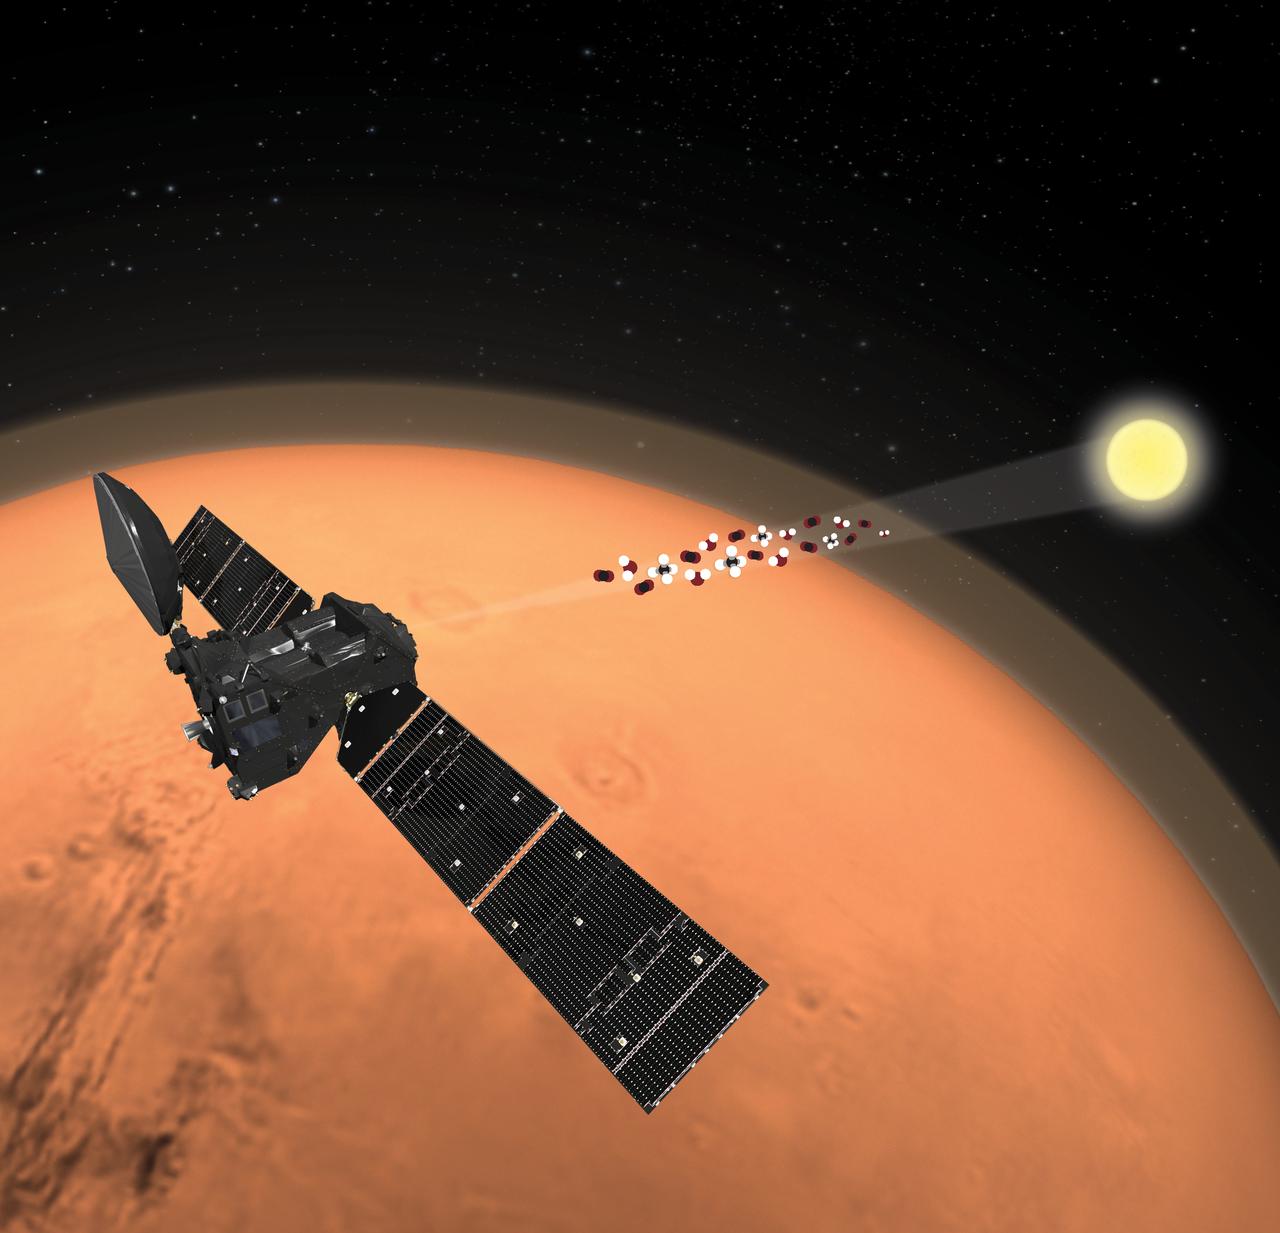 1567214291920-ESA_ExoMars_TGO_solar_occultation_method_1280.jpg